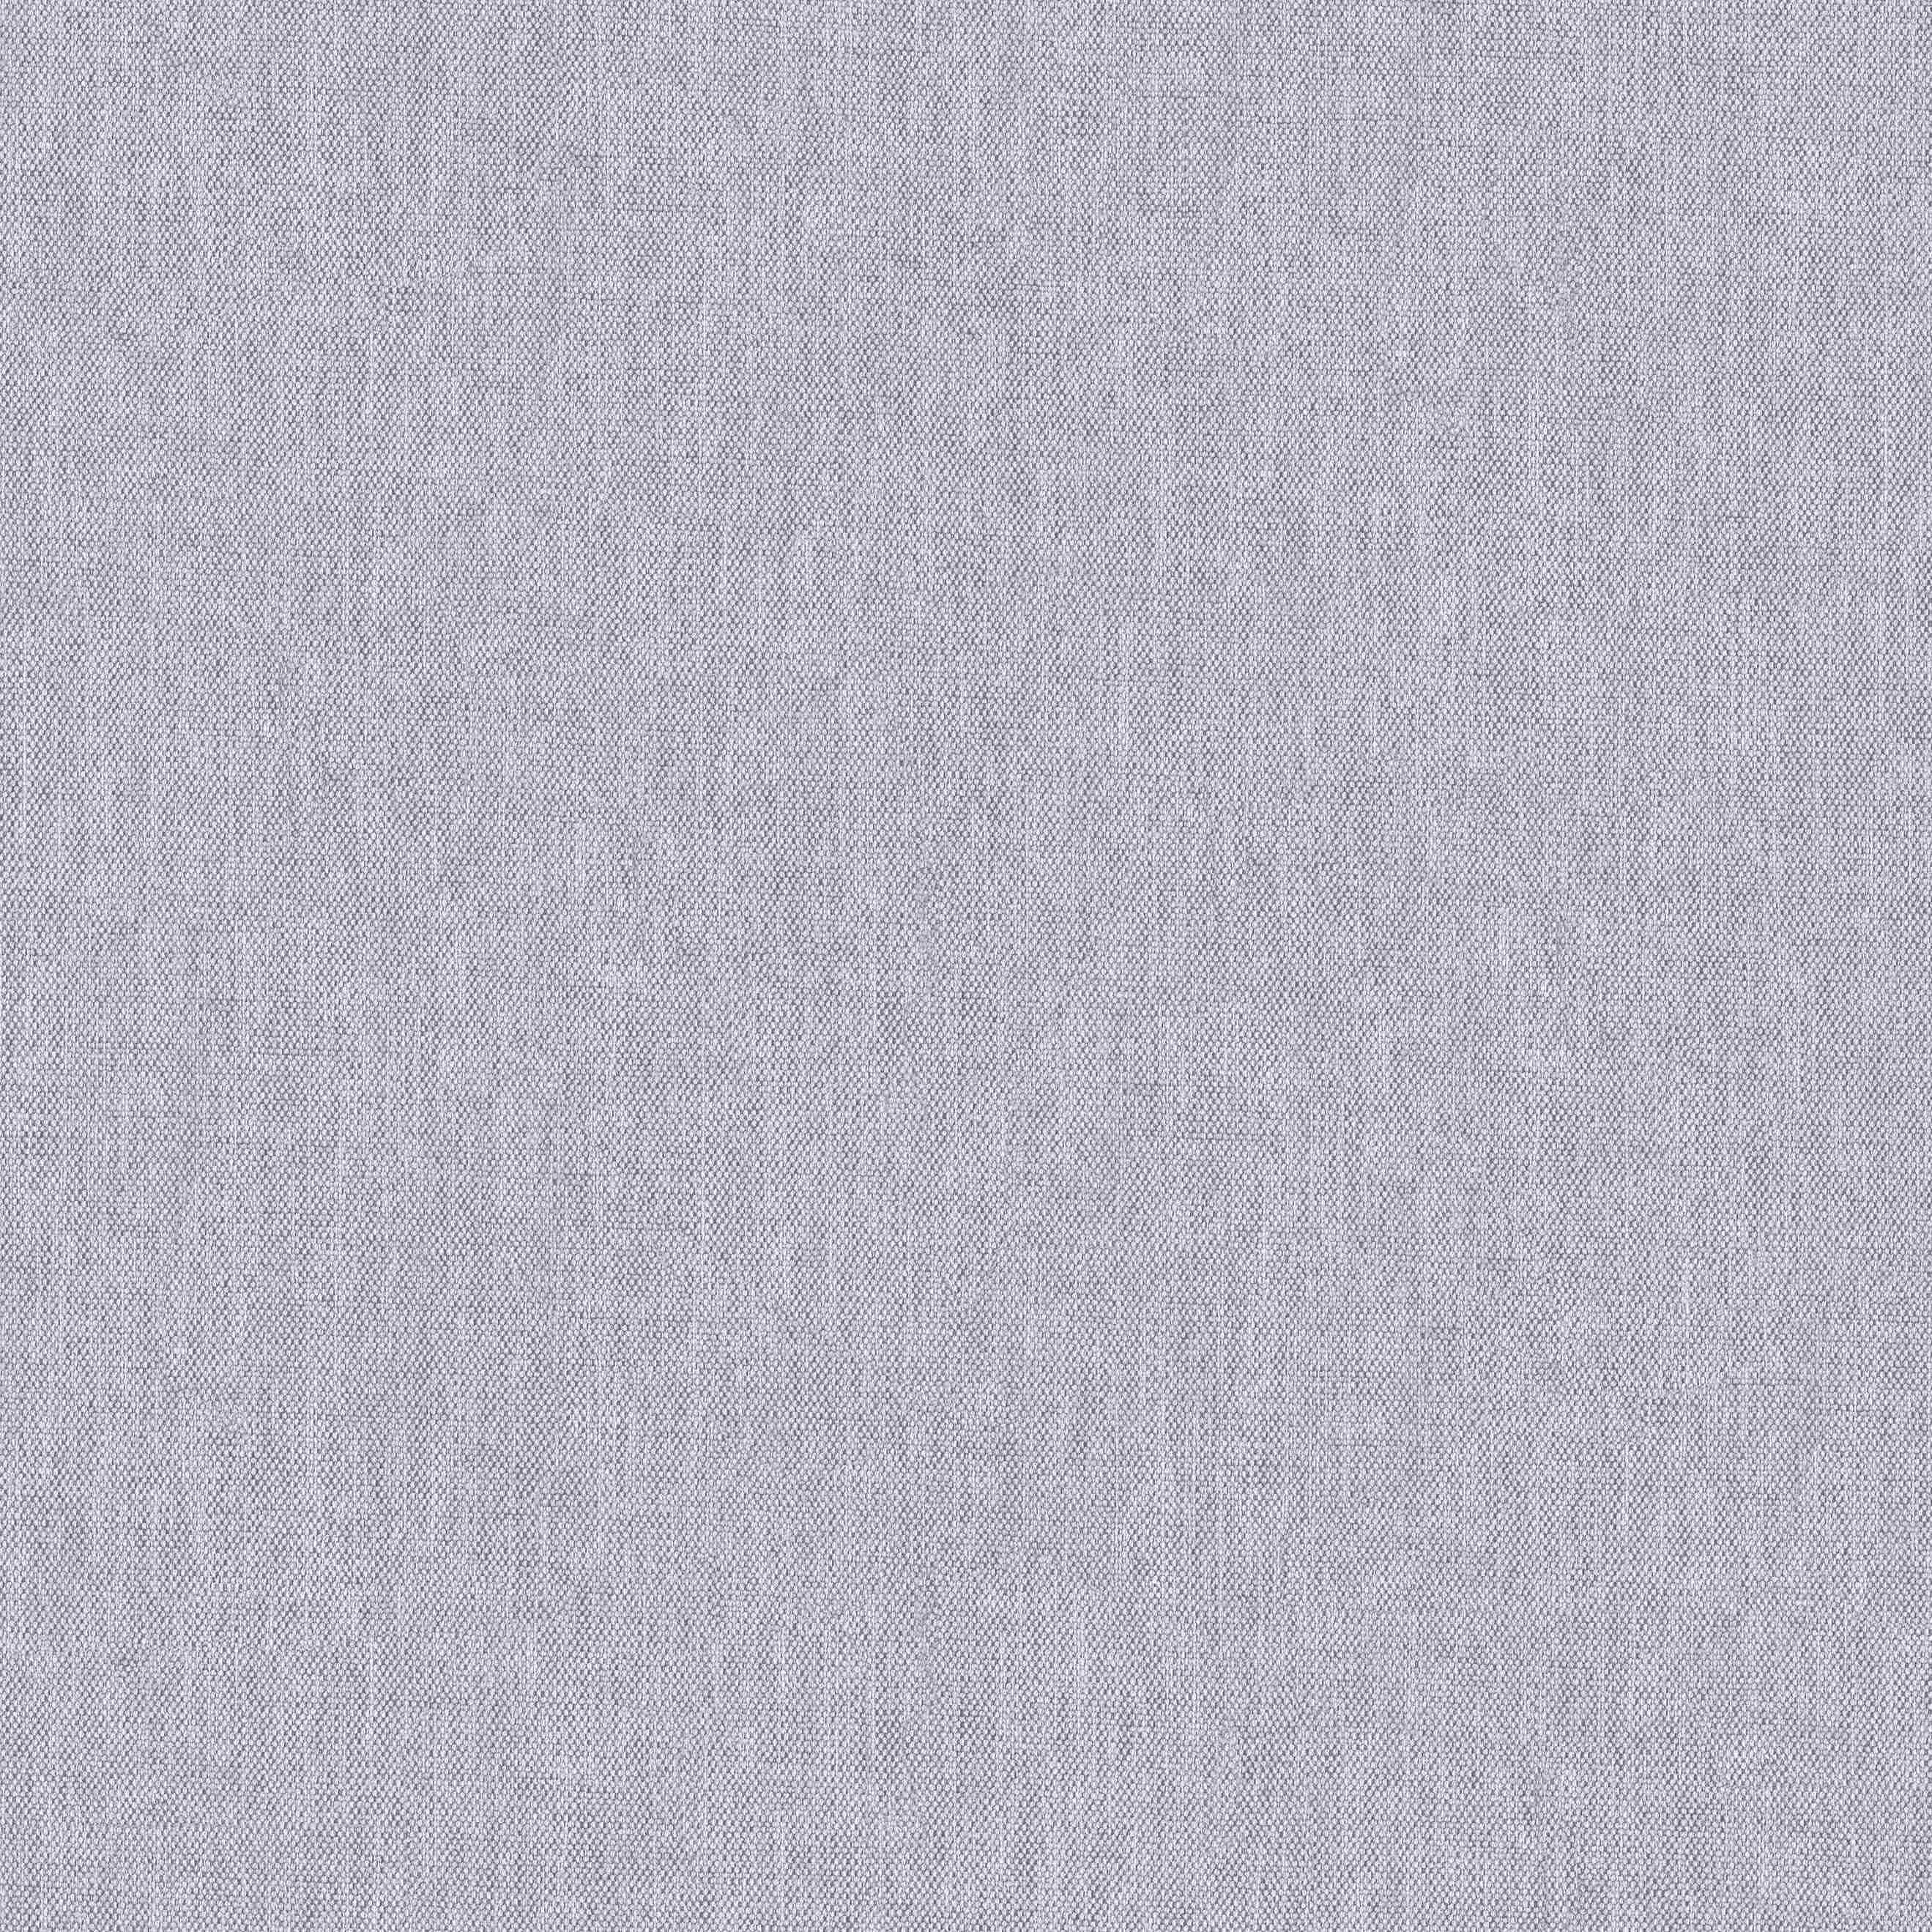 莱斯特(深灰)HEG60081